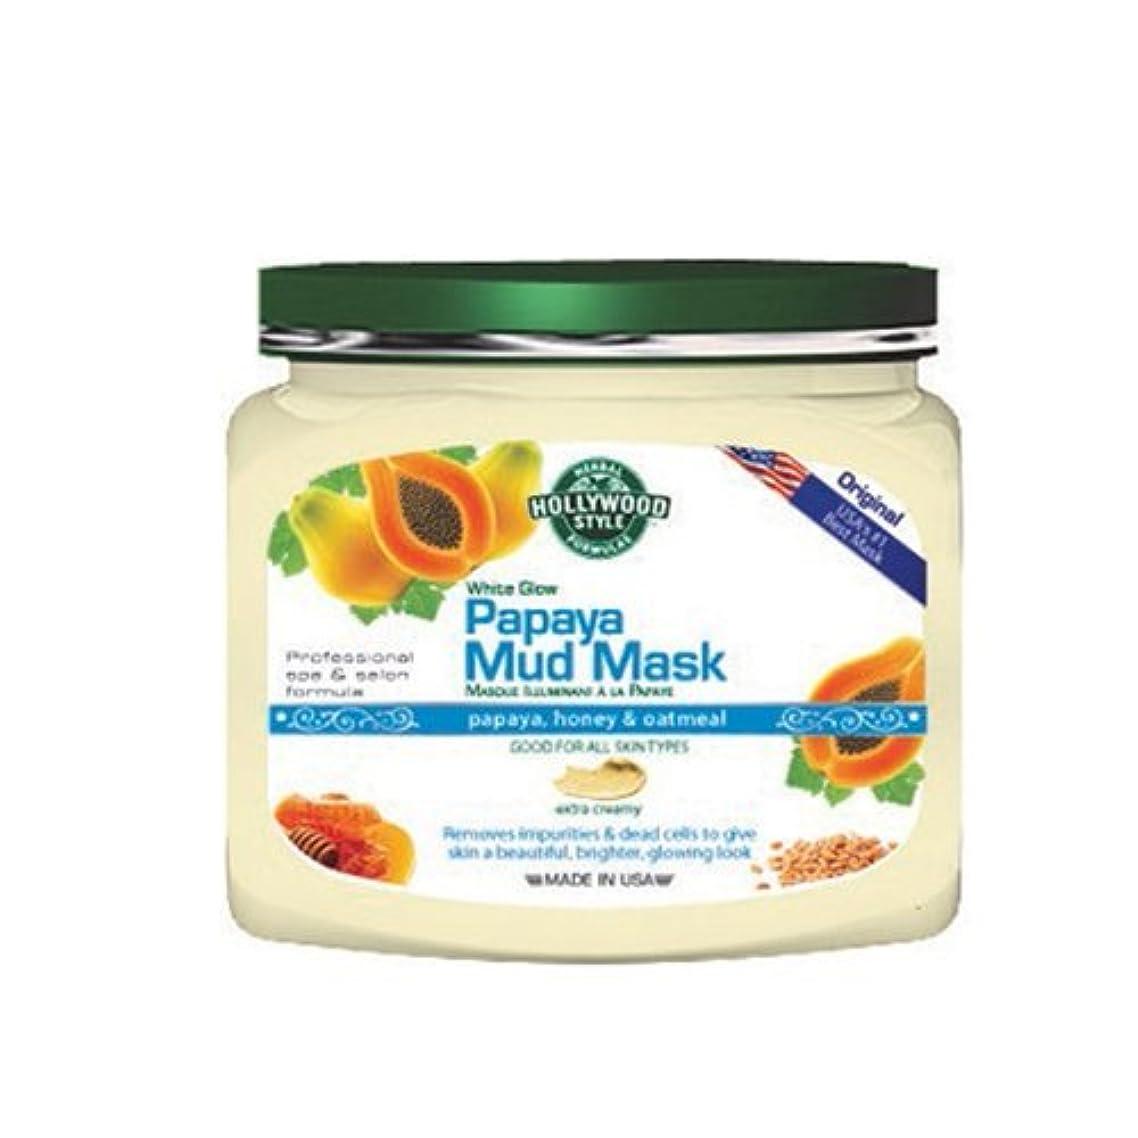 Hollywood Style White Glow Papaya Mud Mask - Refines, Purifies, & Exfoliates - 320gm Jar